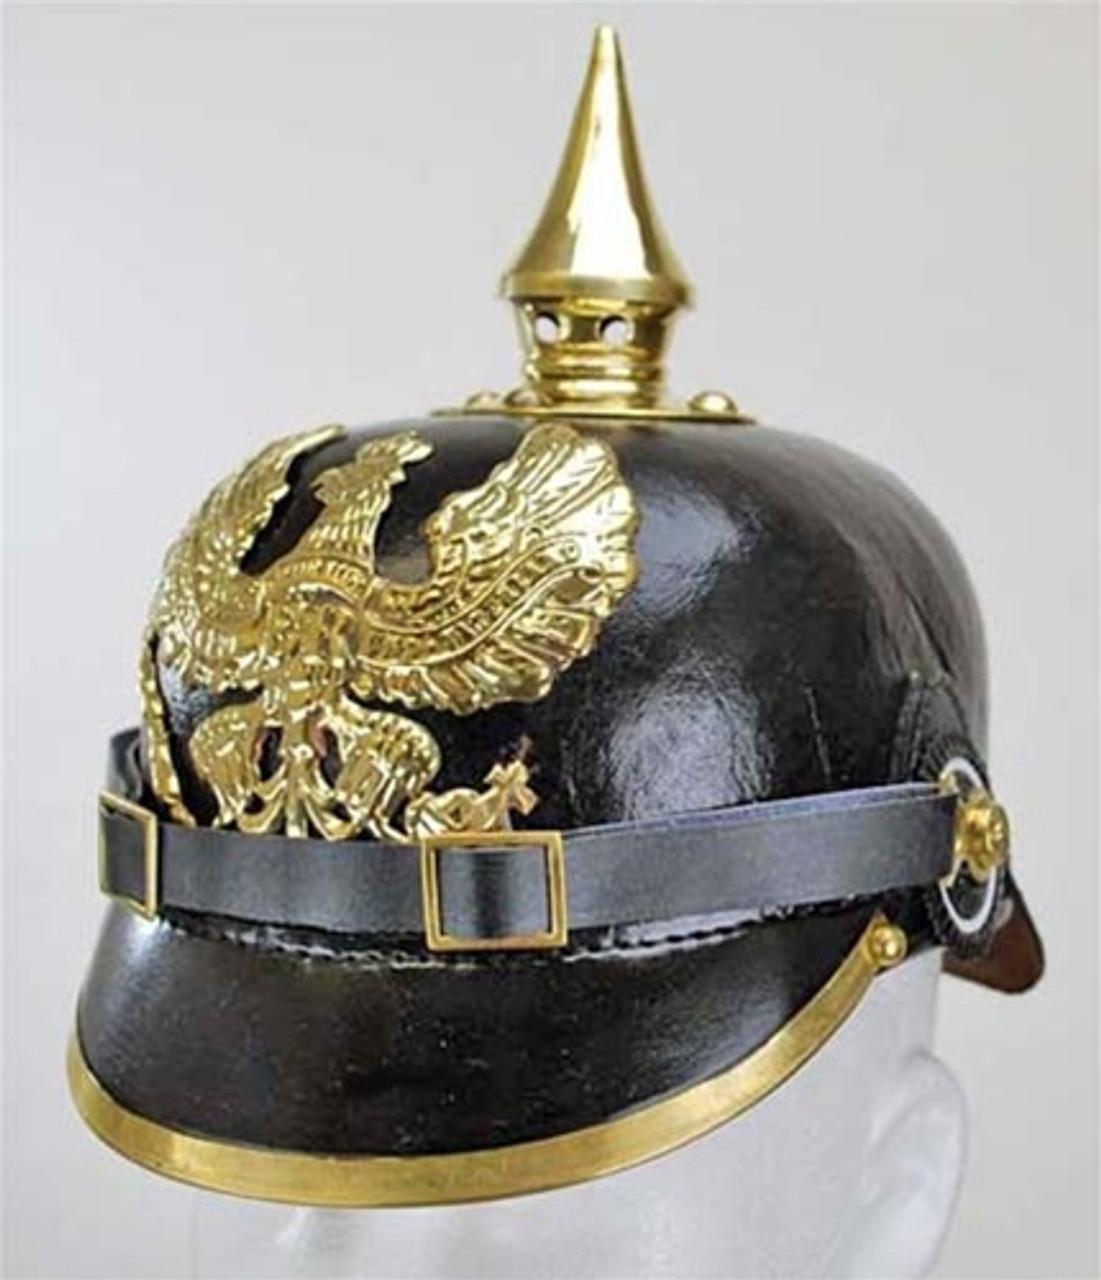 Reproduction German Pickelhaube (Spiked Helmet) from Hessen Antique